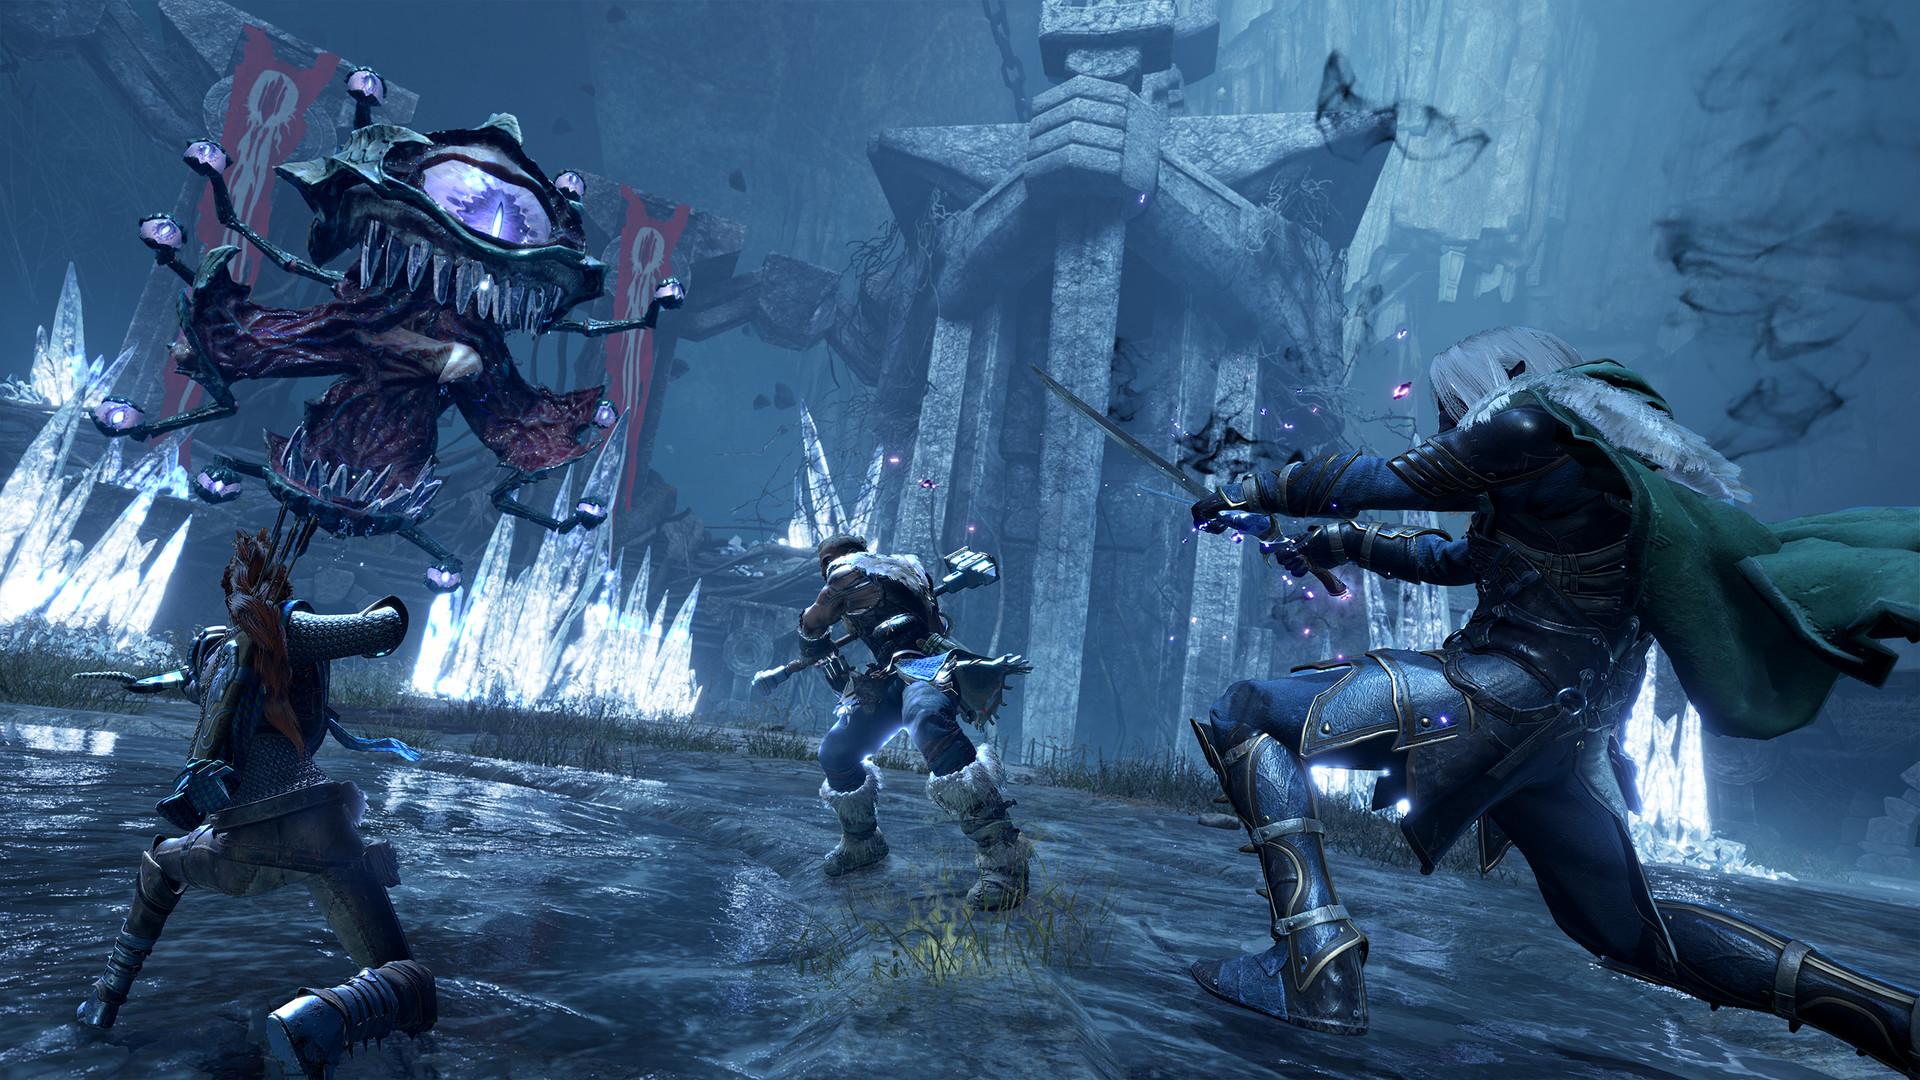 dungeons-and-dragons-dark-alliance-pc-screenshot-3